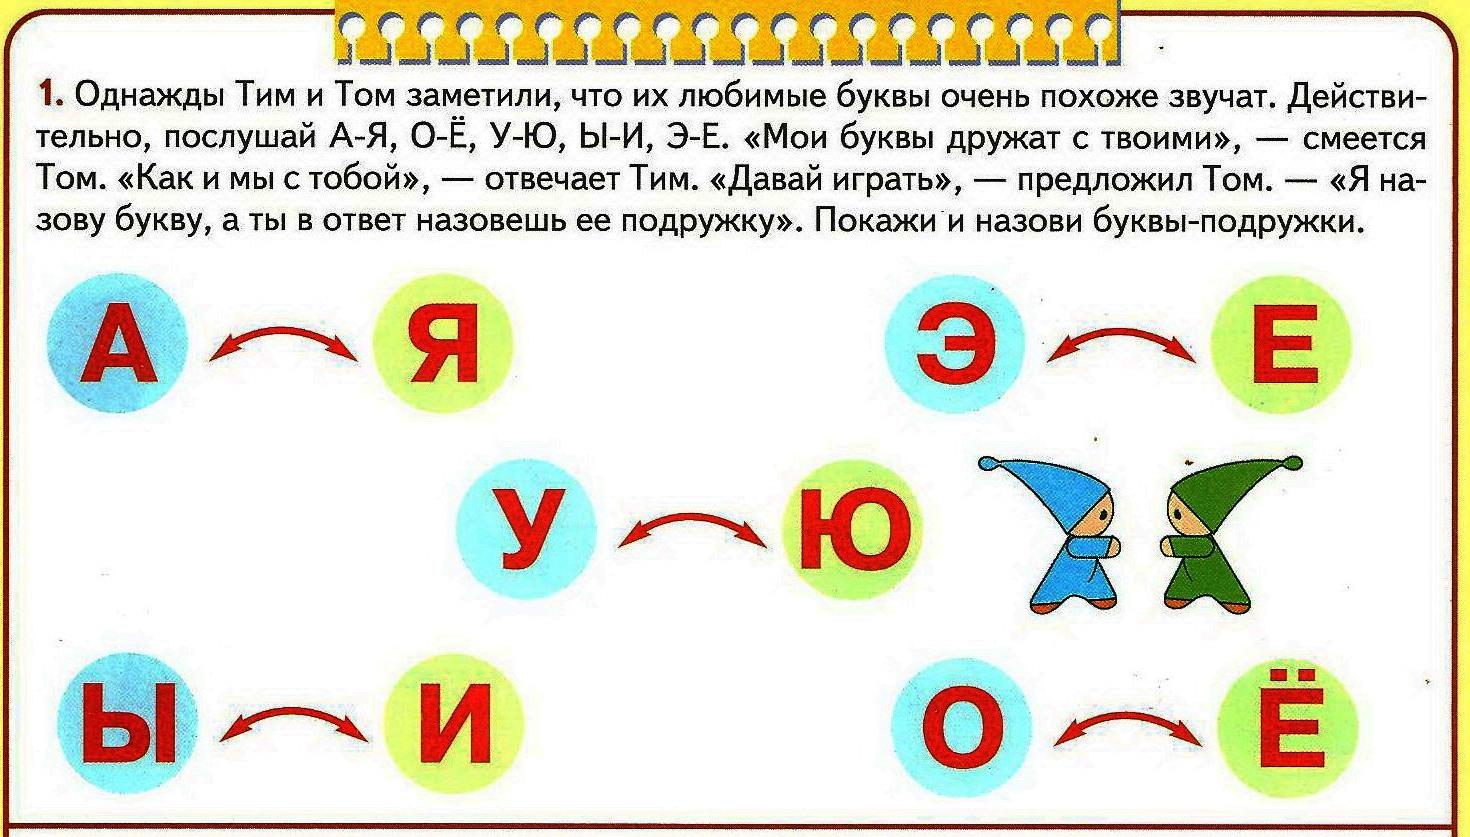 картинка по обучению грамоте звуки речи аденопатия шеи